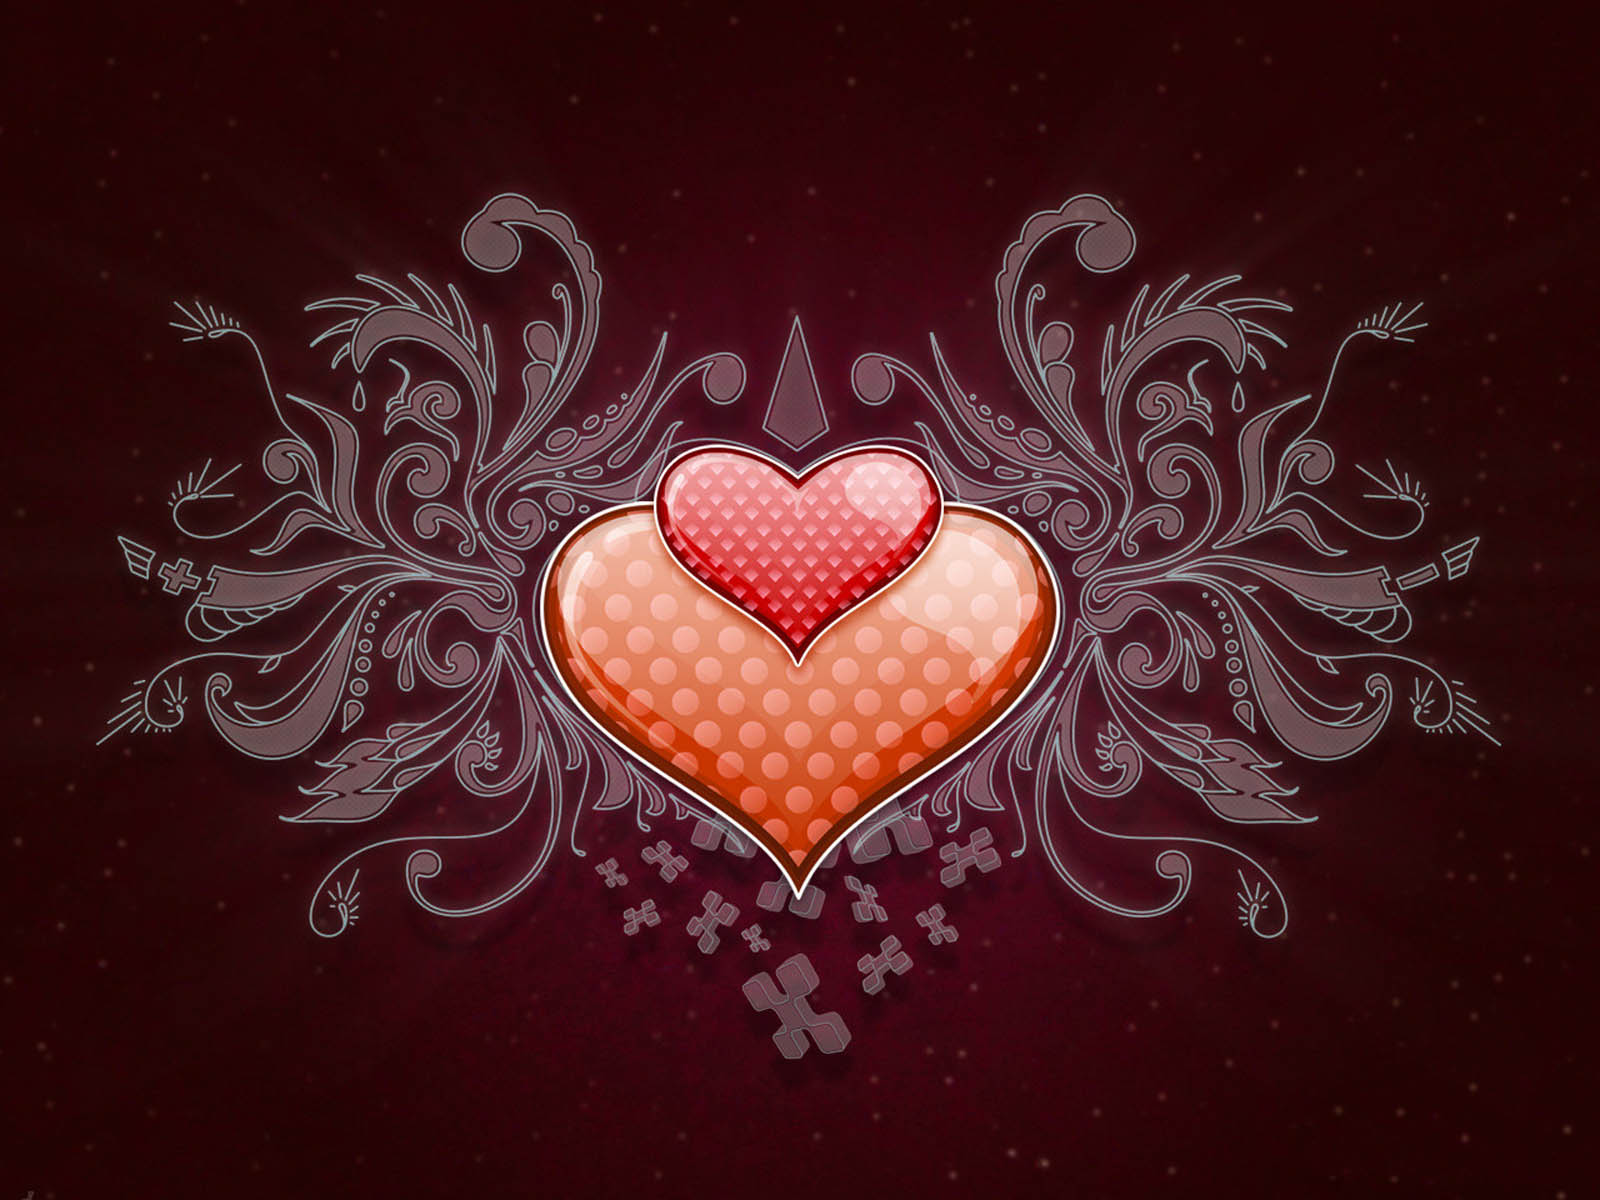 love desktop wallpaper,heart,red,love,valentine's day,organ